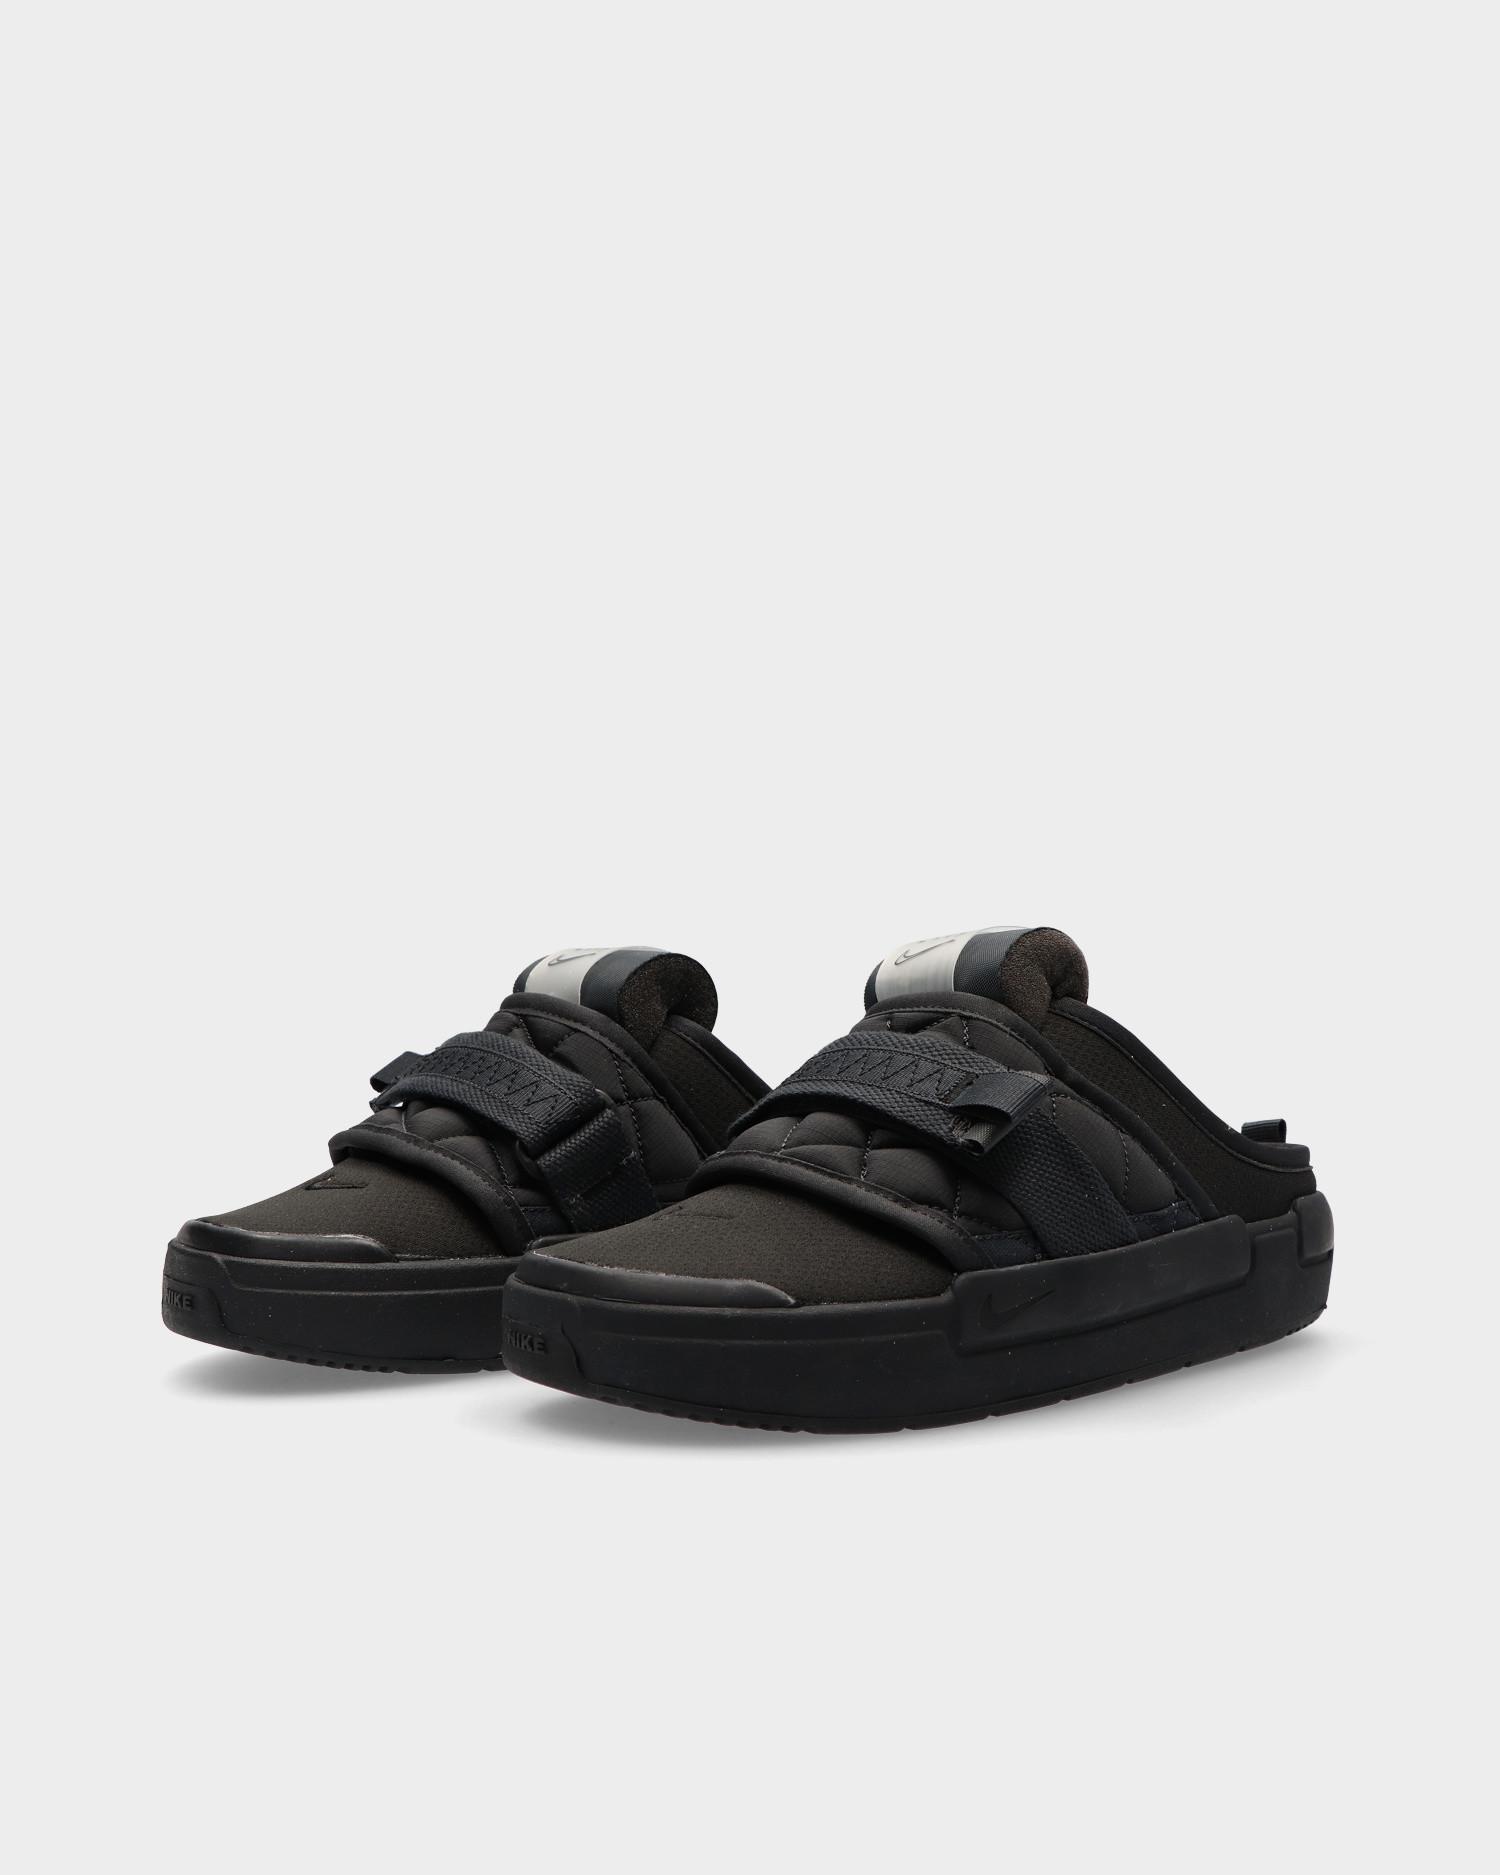 Nike Offline Off noir/black-off noir-team orange